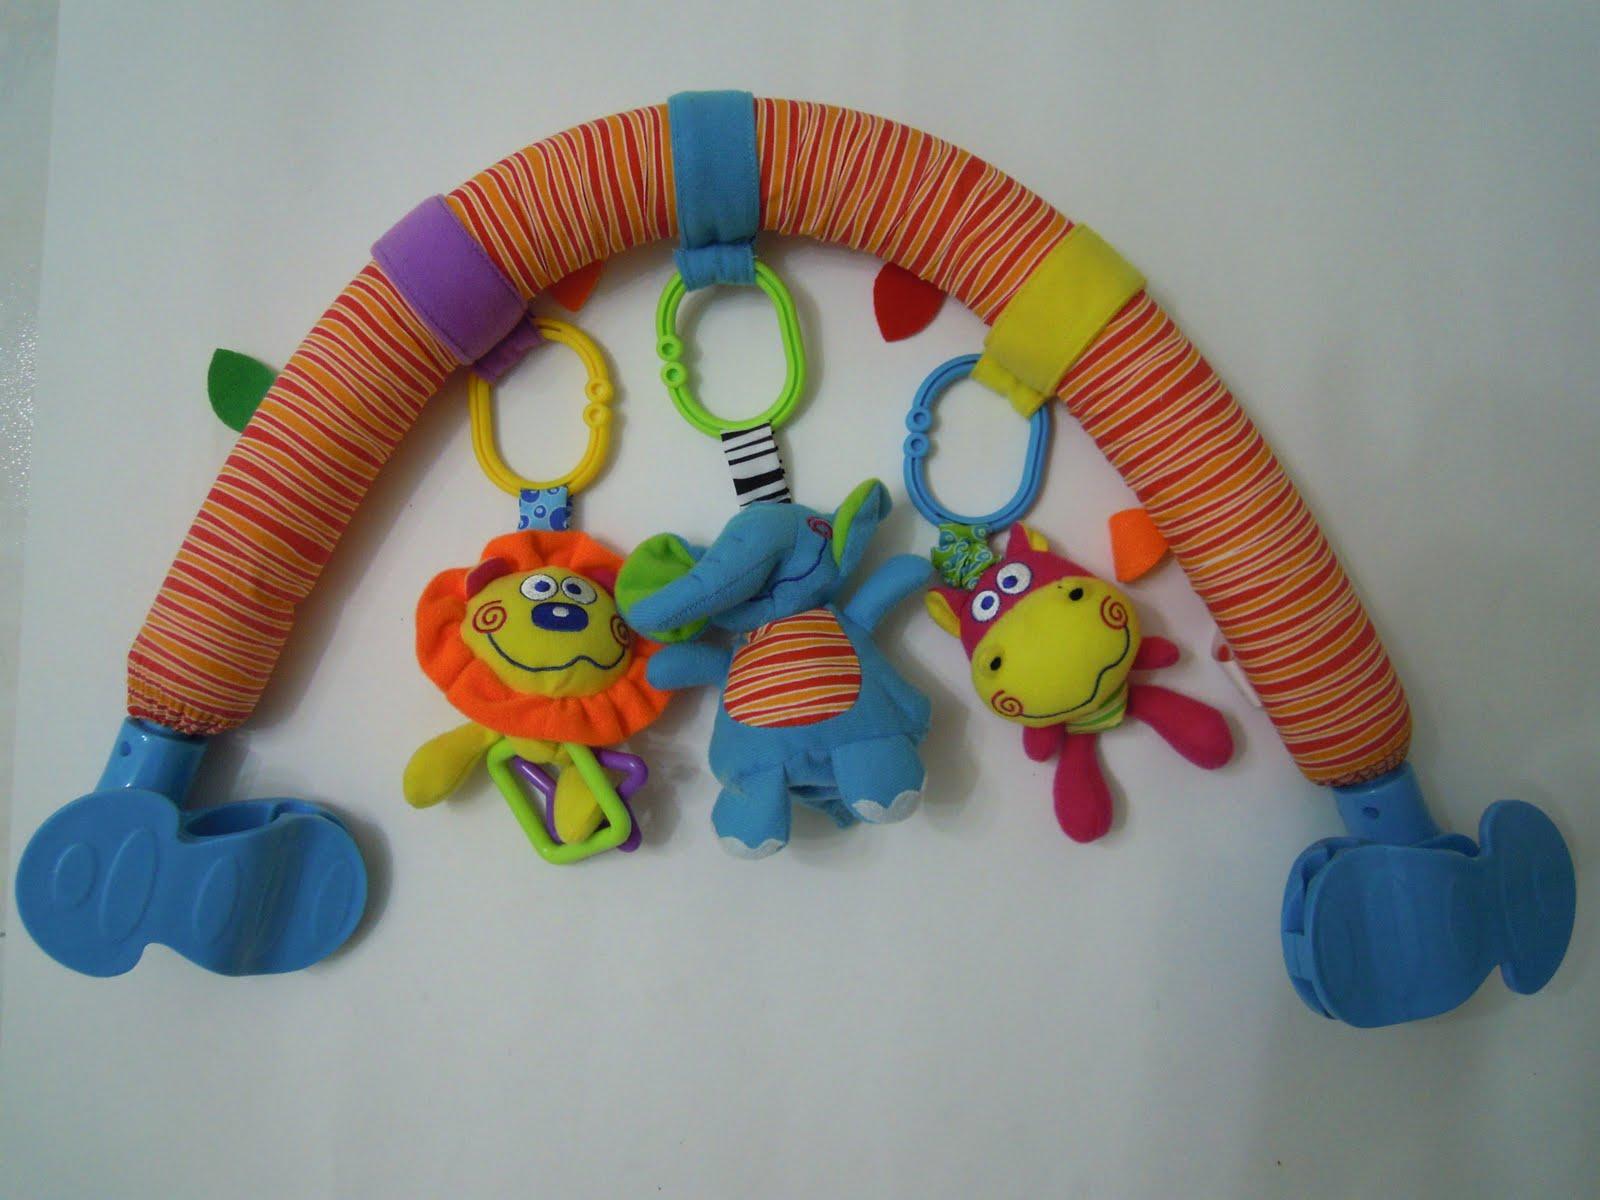 dimple pram toys